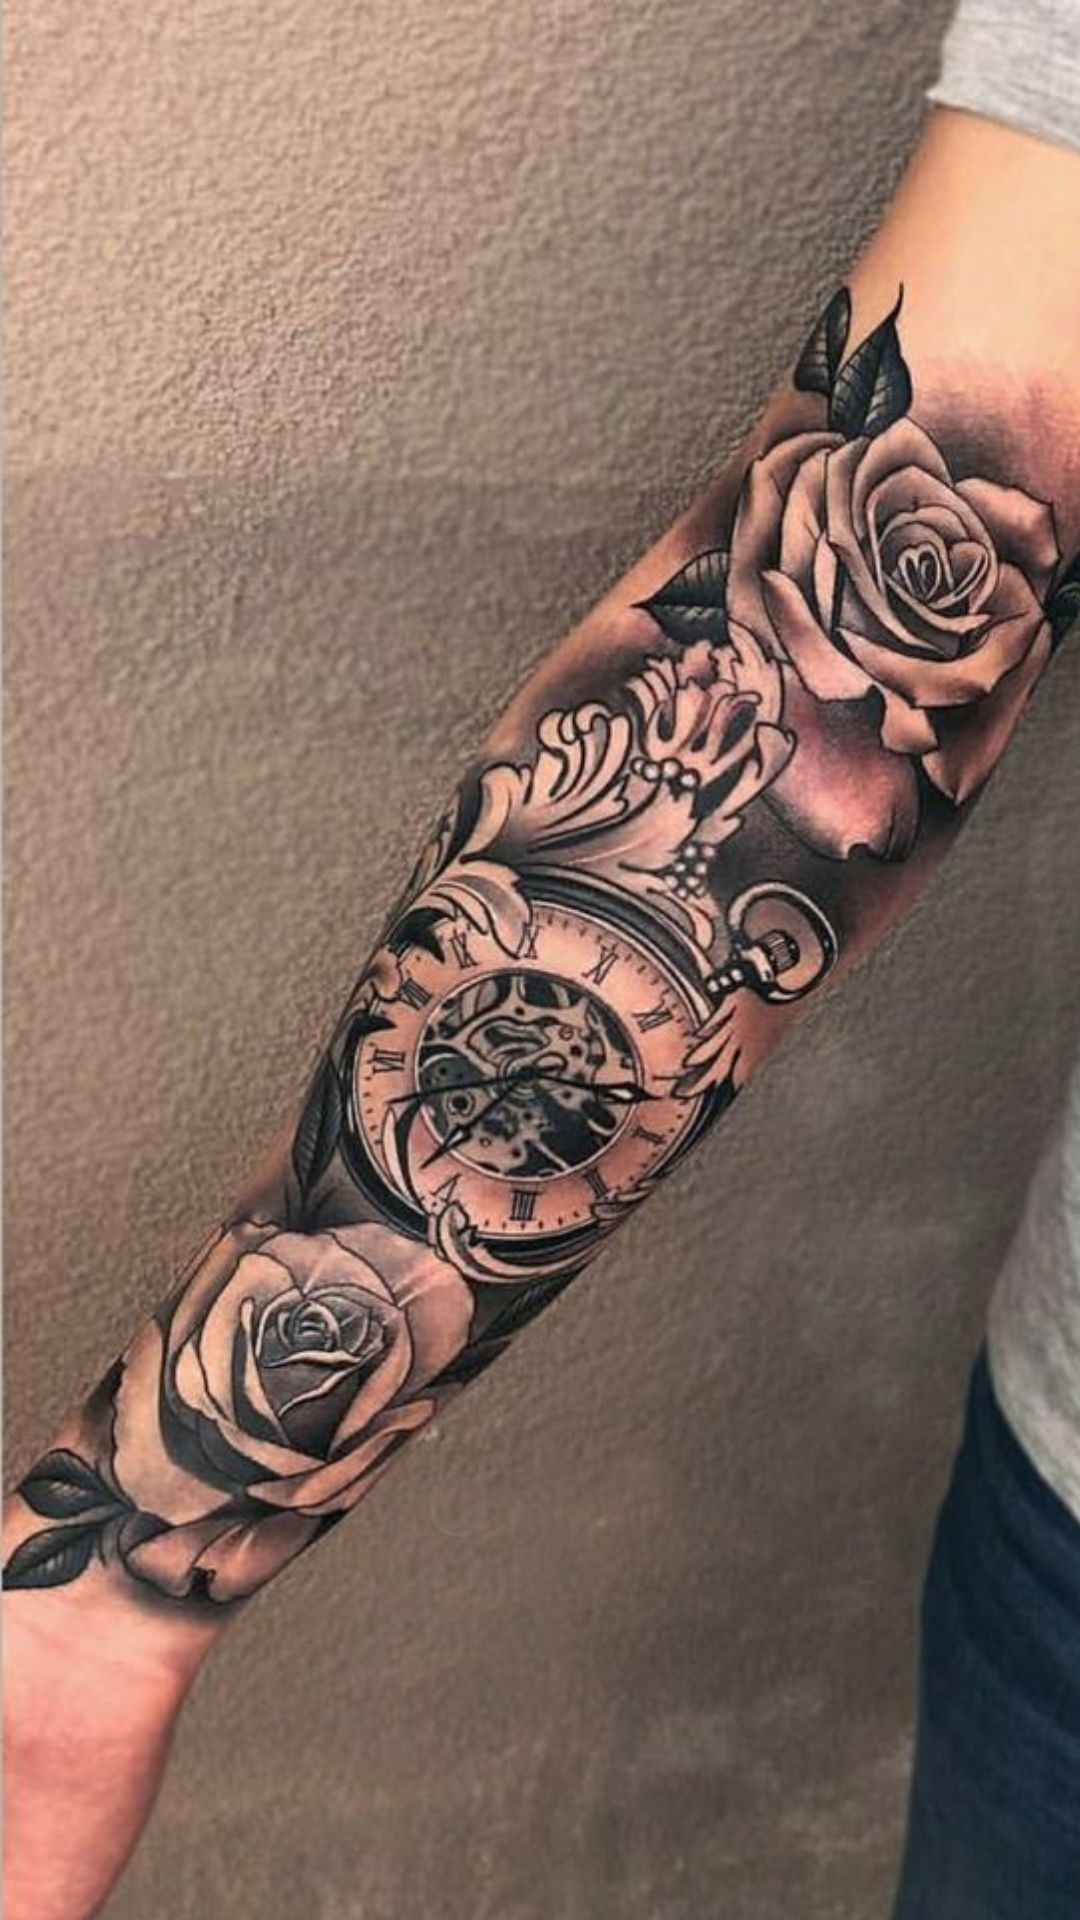 Tattoo Hand Tattoos For Guys Sleeve Tattoos Hand Tattoos